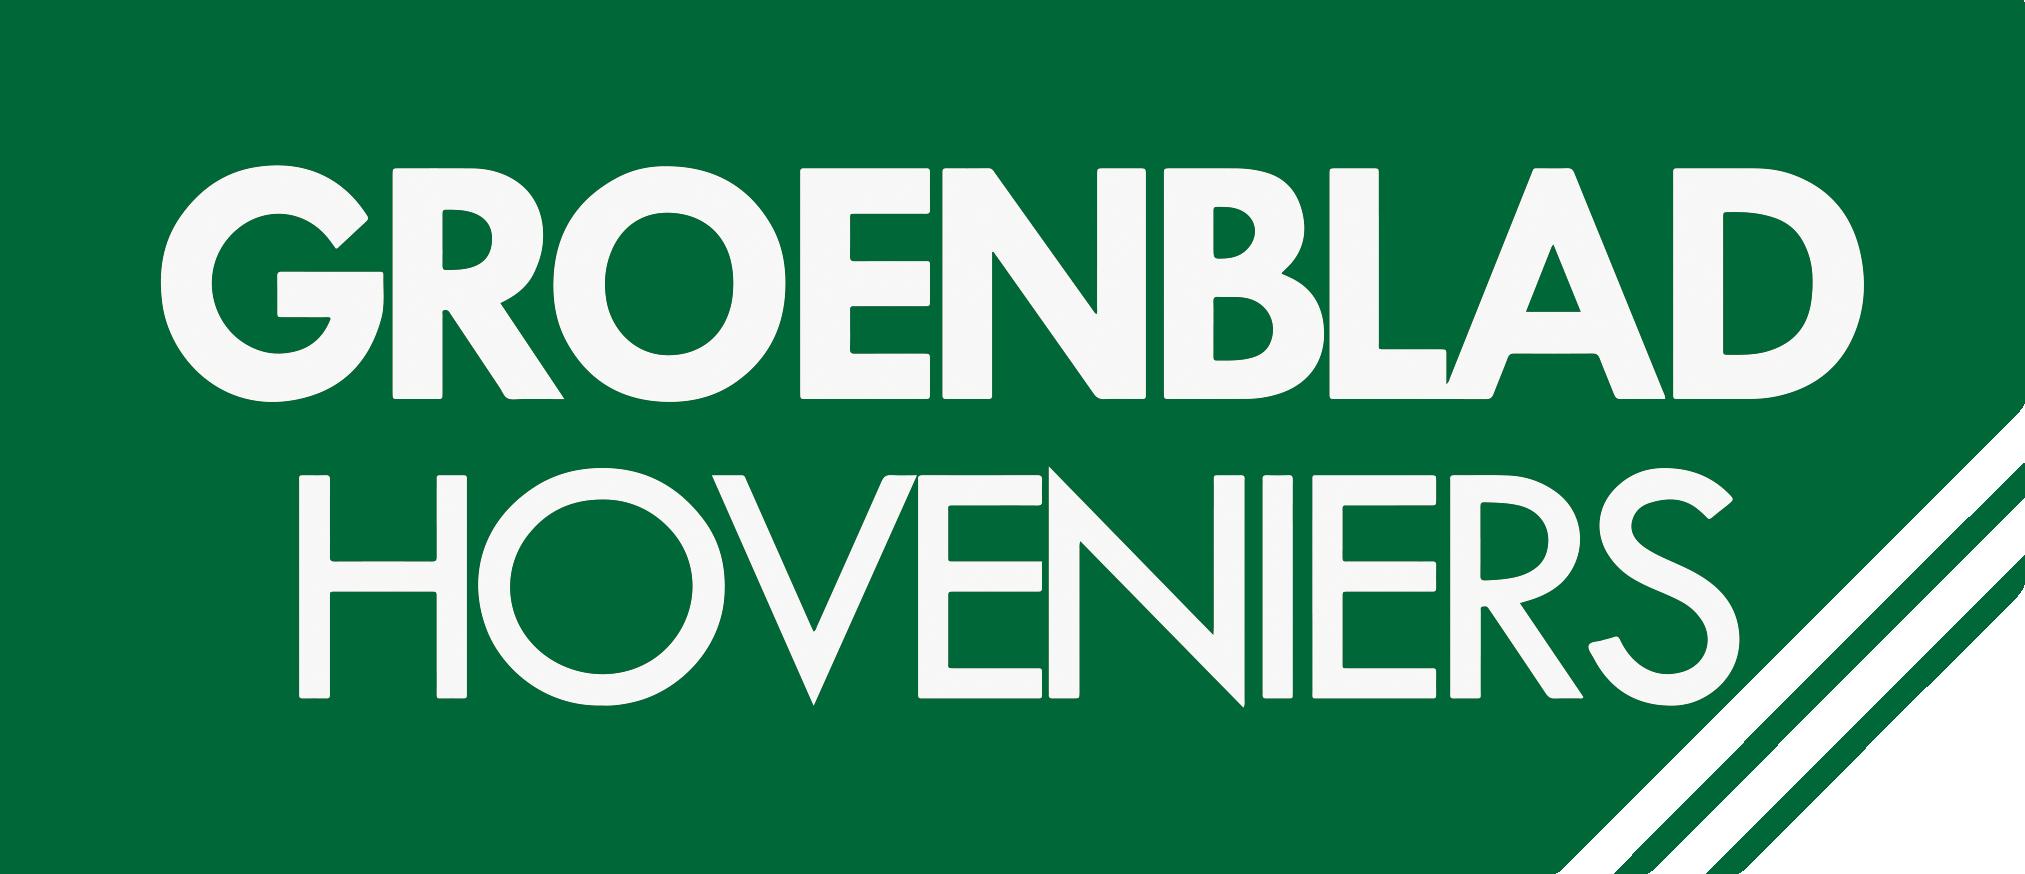 Groenblad Hoveniers